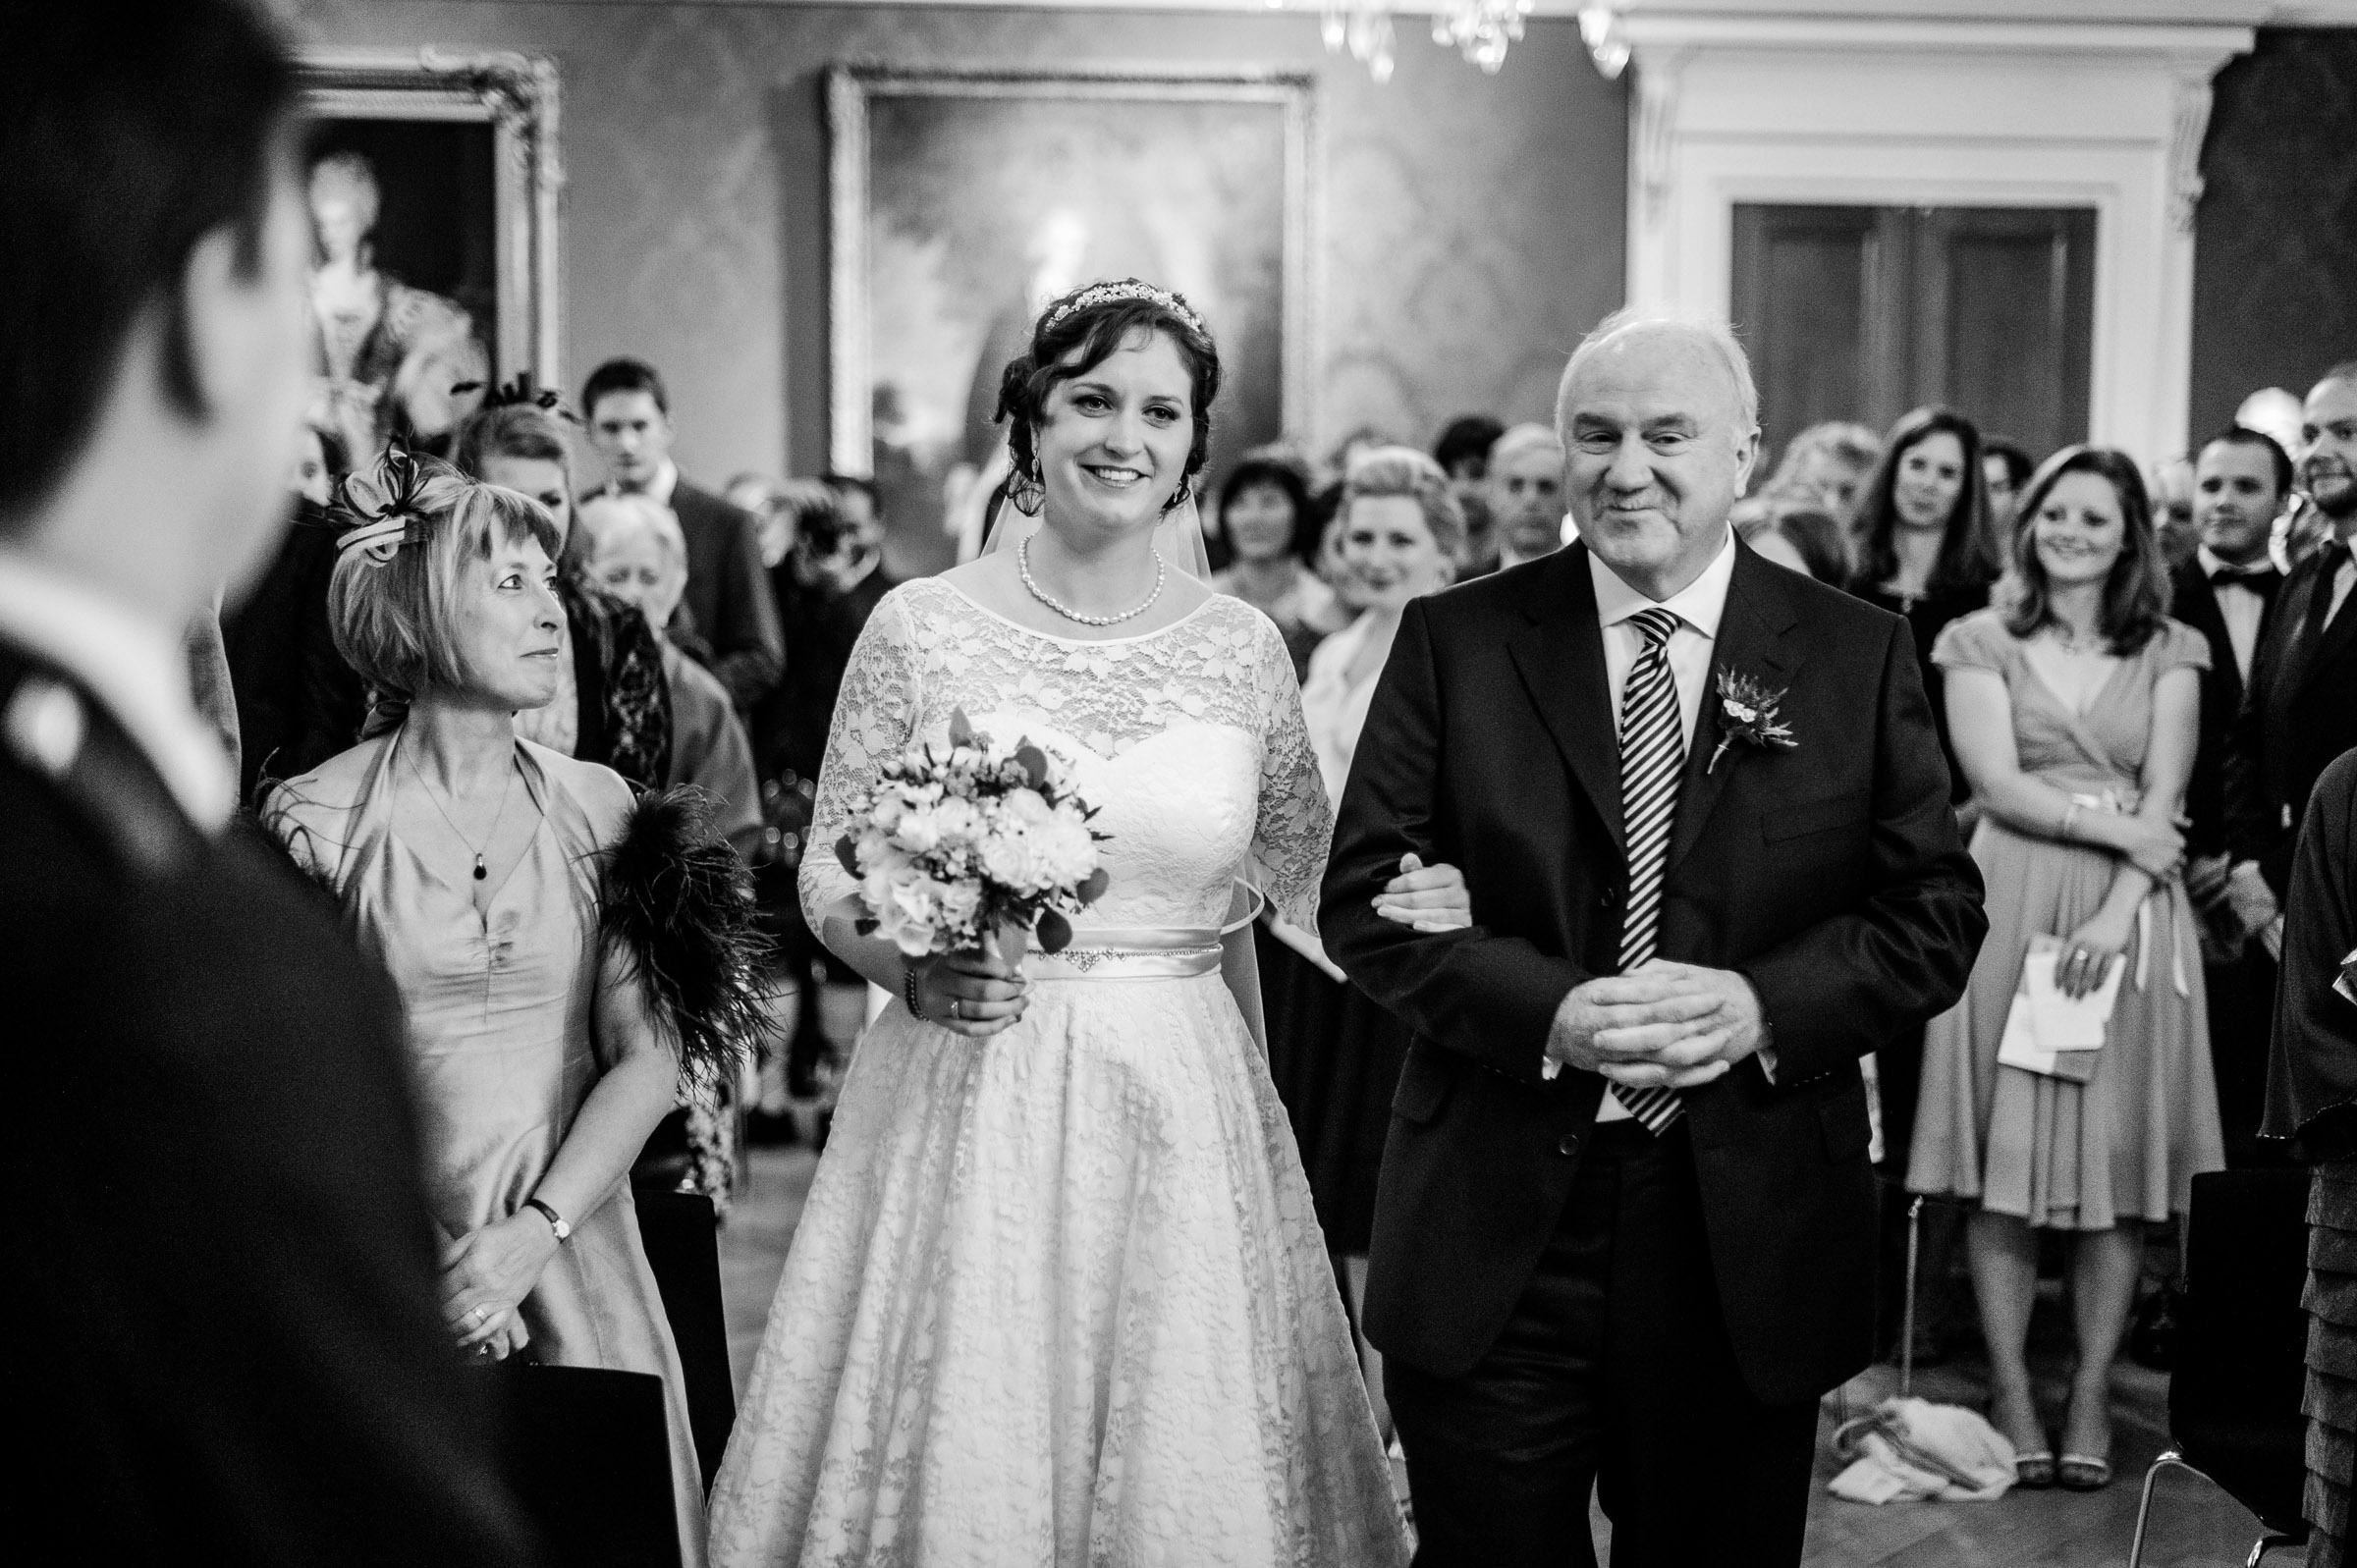 Ashmolean-Museum-Wedding-Pictures-0026.jpg